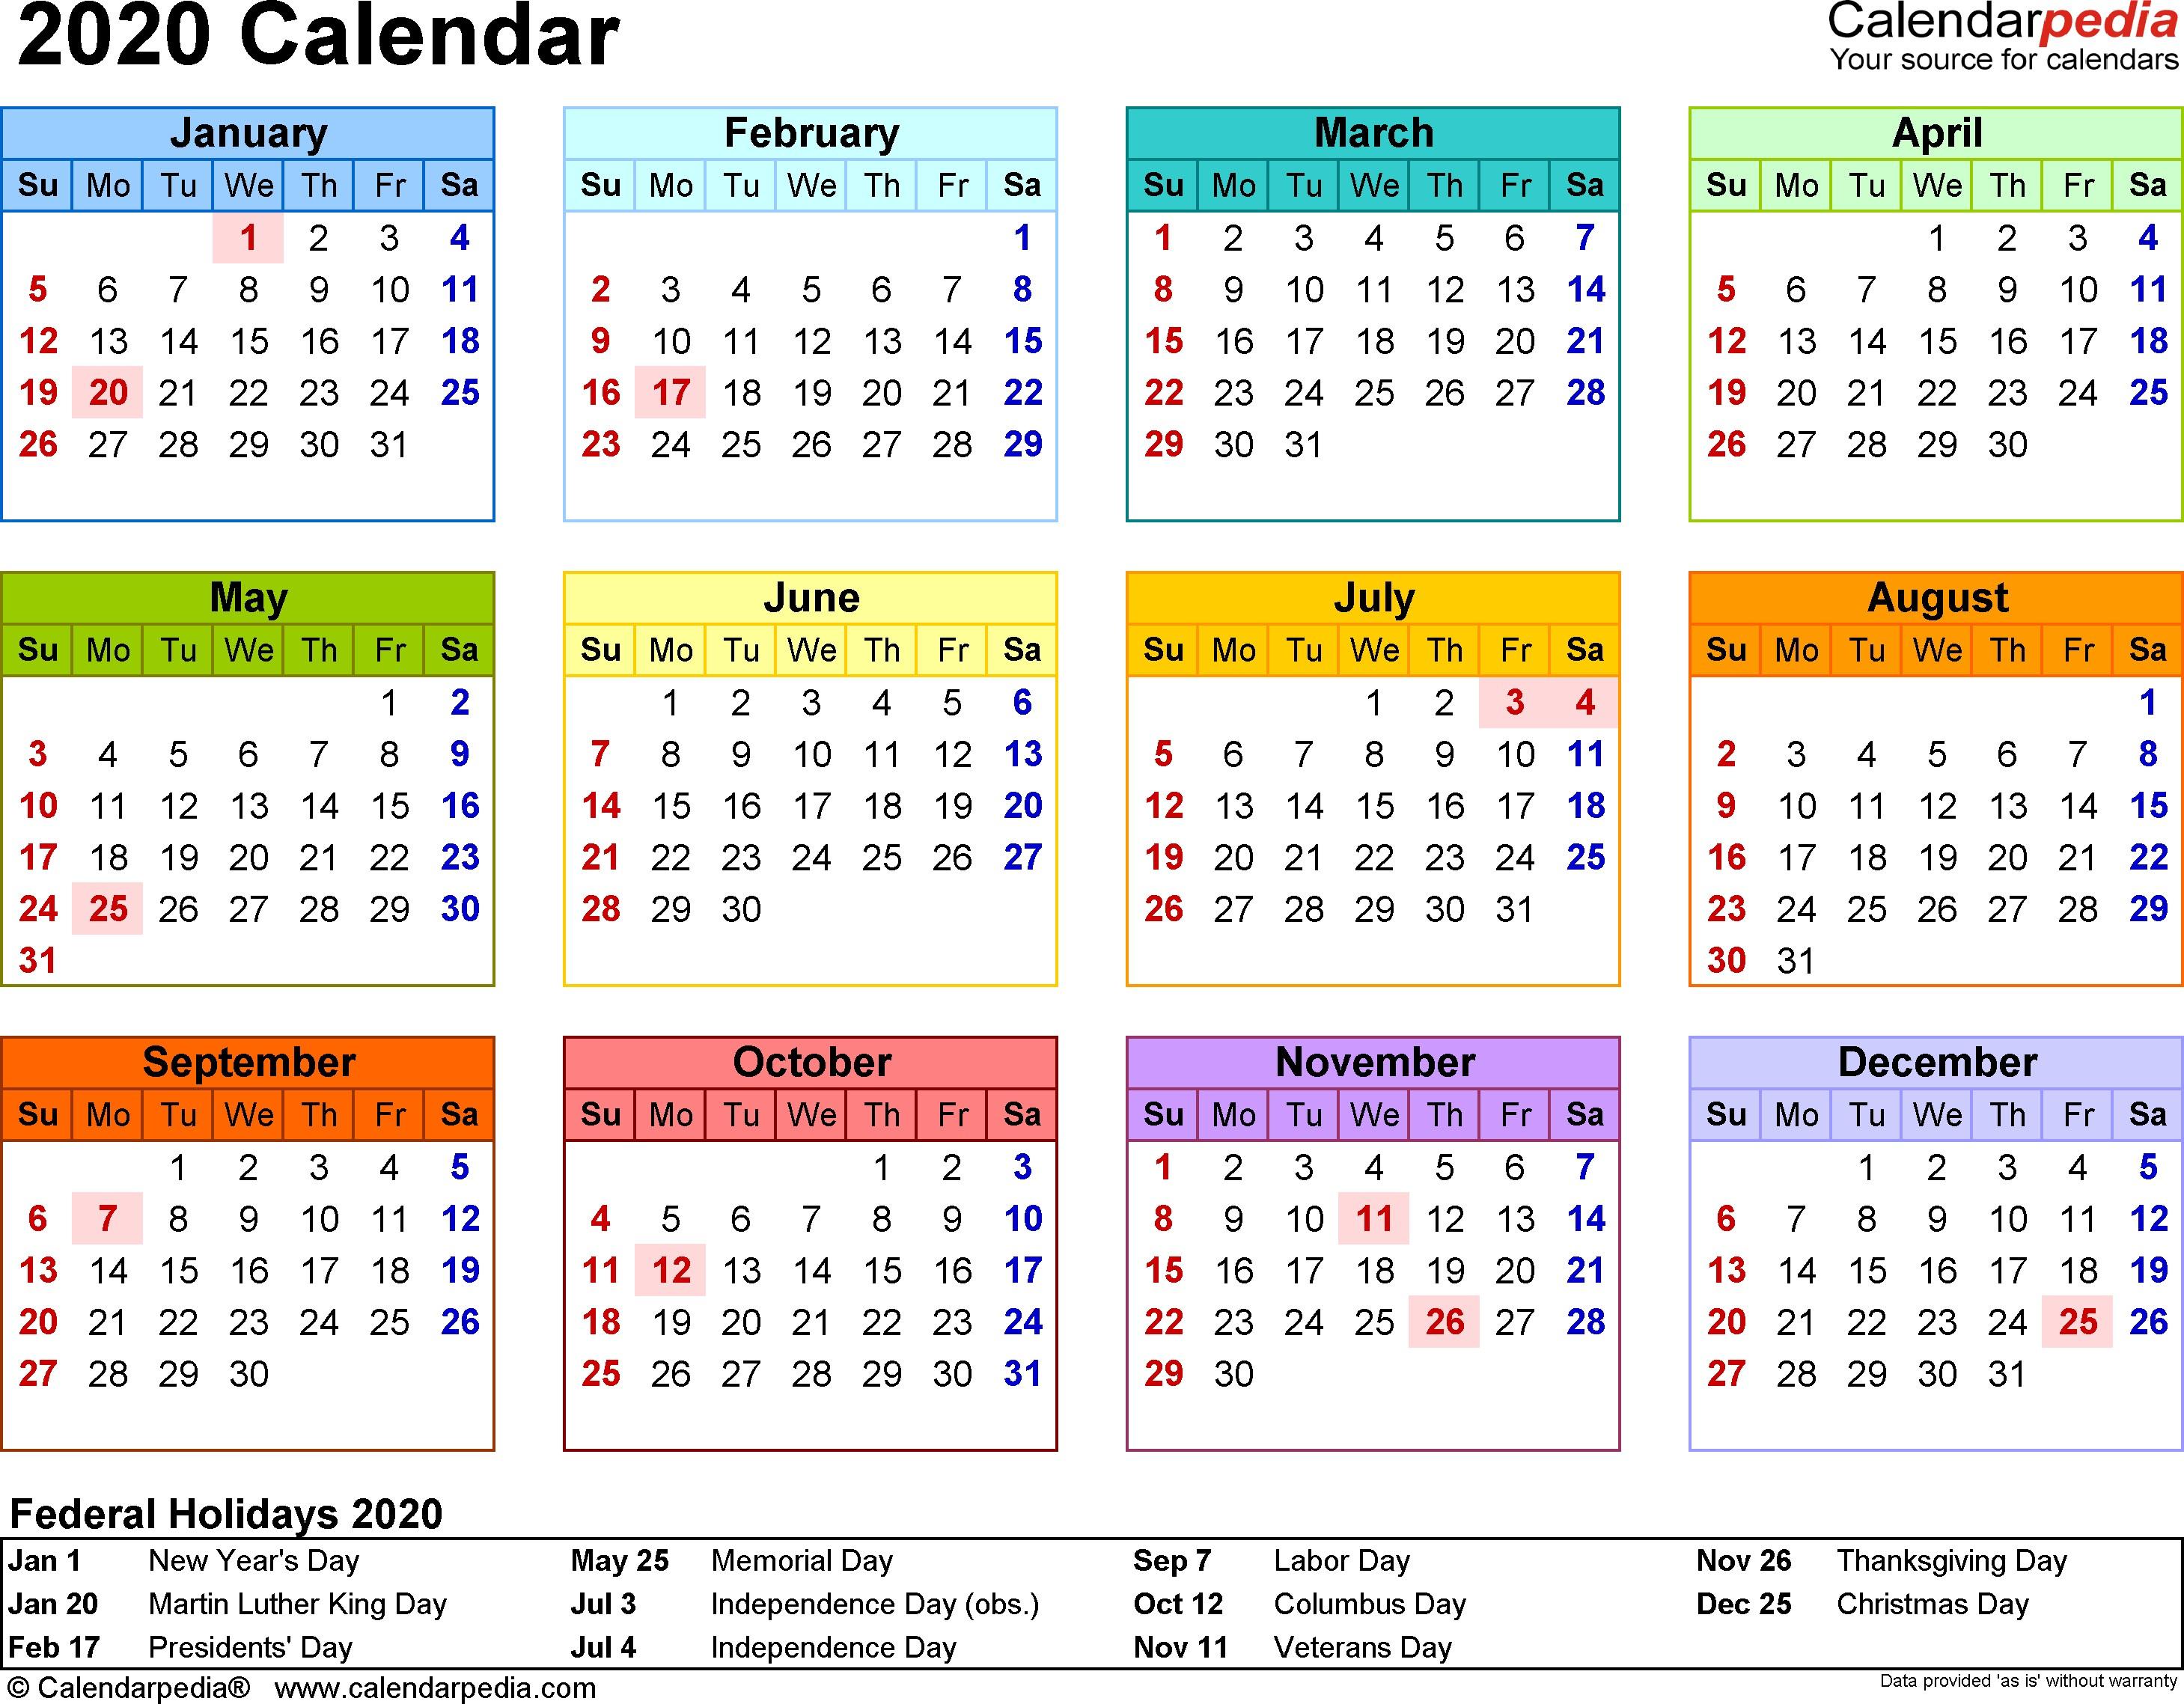 Free 2020 Printable Calendar Template 2020 Calendar 17 Free Printable Word Calendar Templates